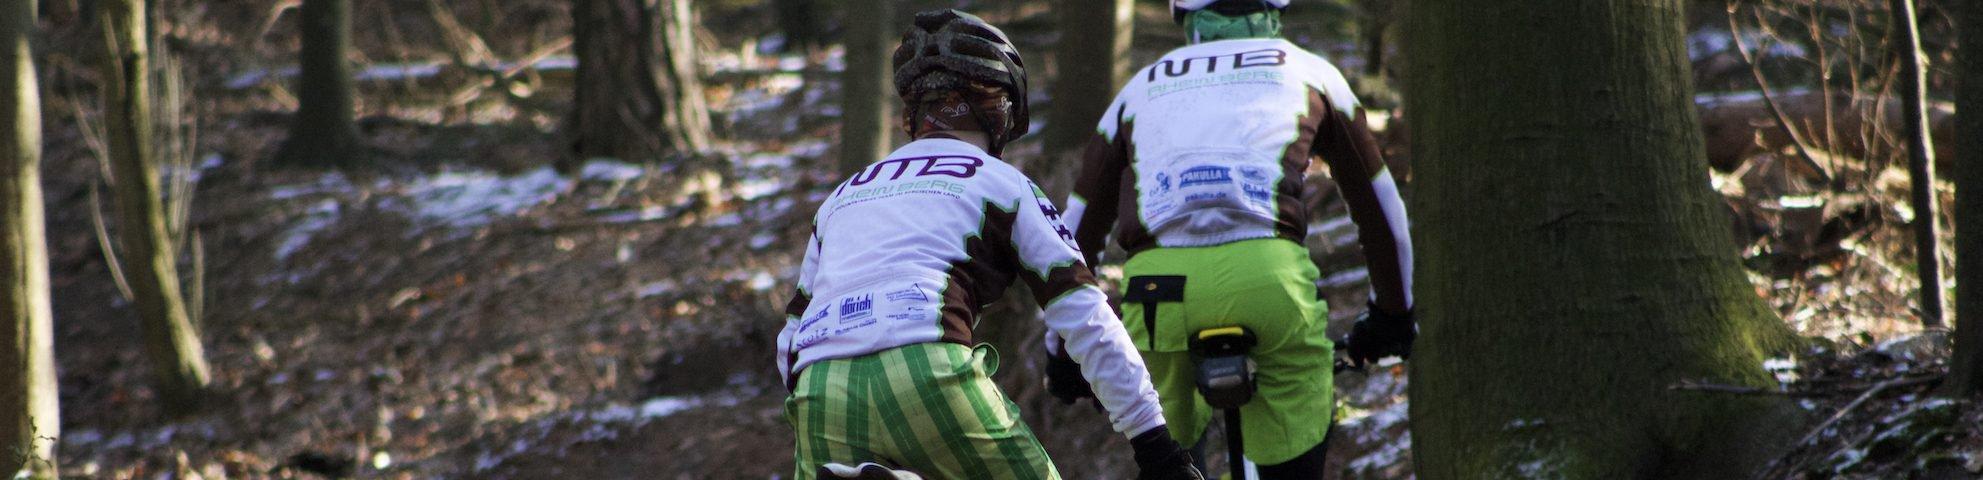 Header Image - Mountainbike RheinBerg e.V.